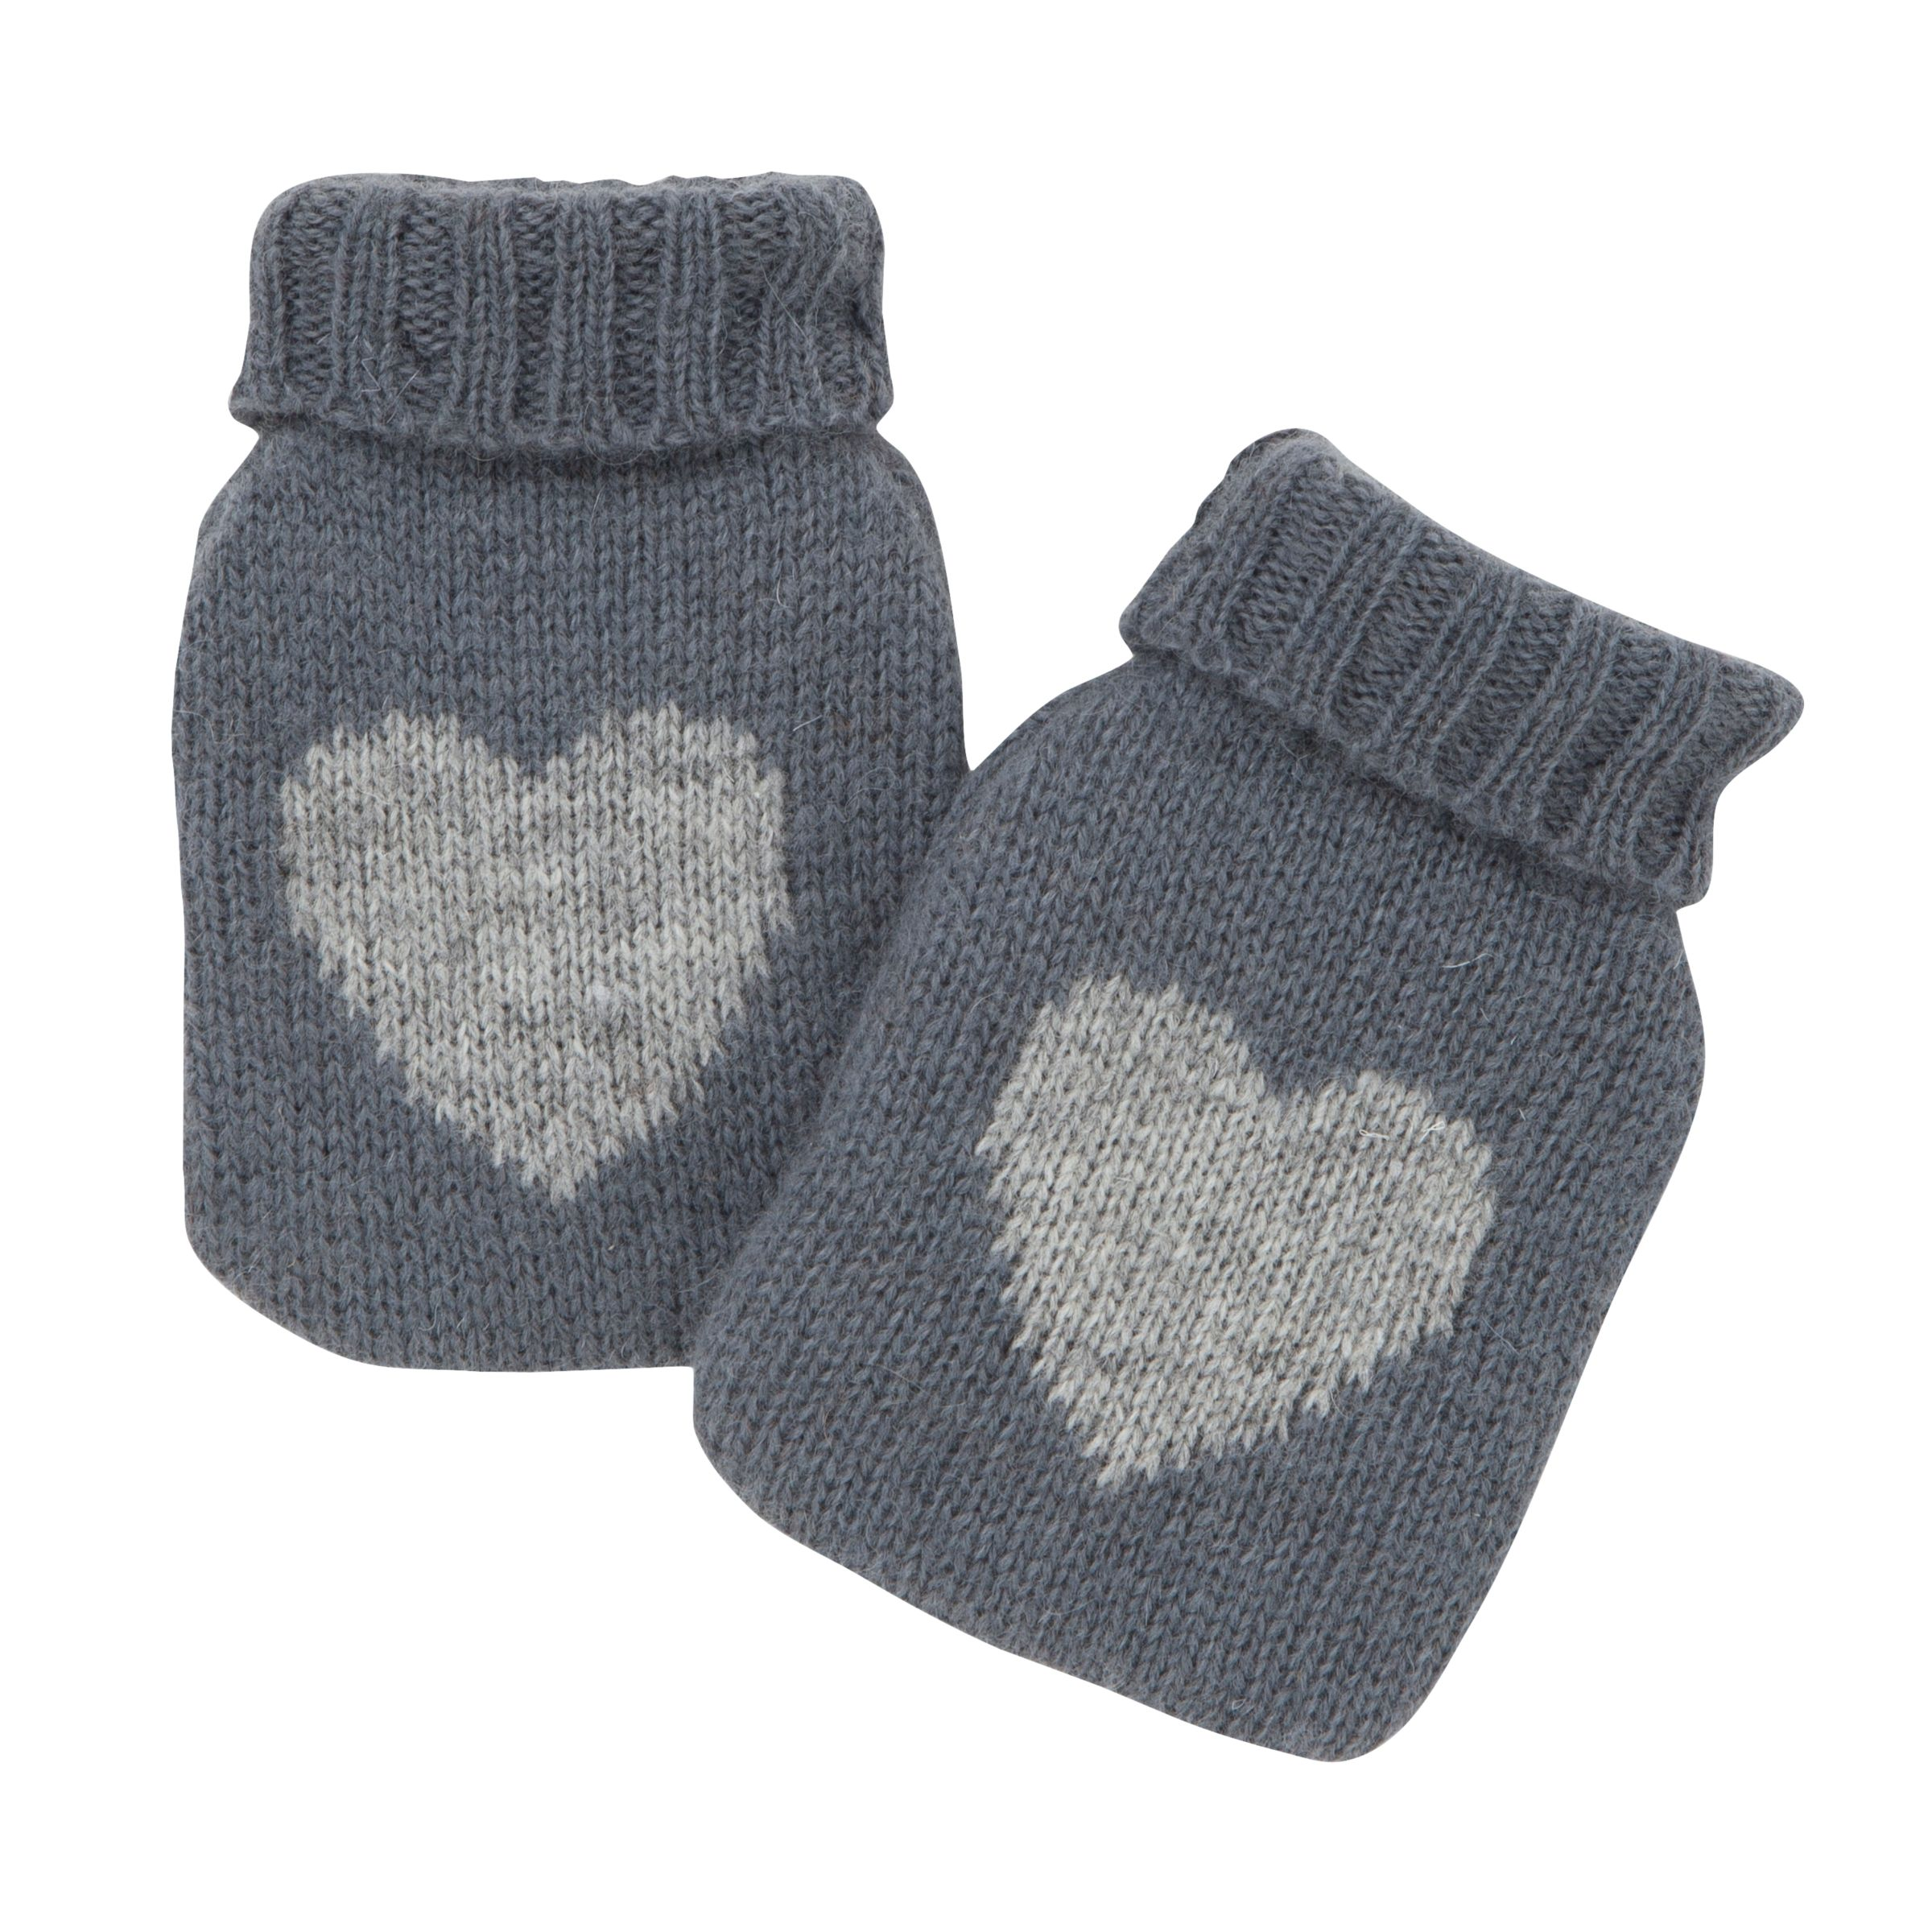 John Lewis Knit Heart Print Handwarmers, Grey